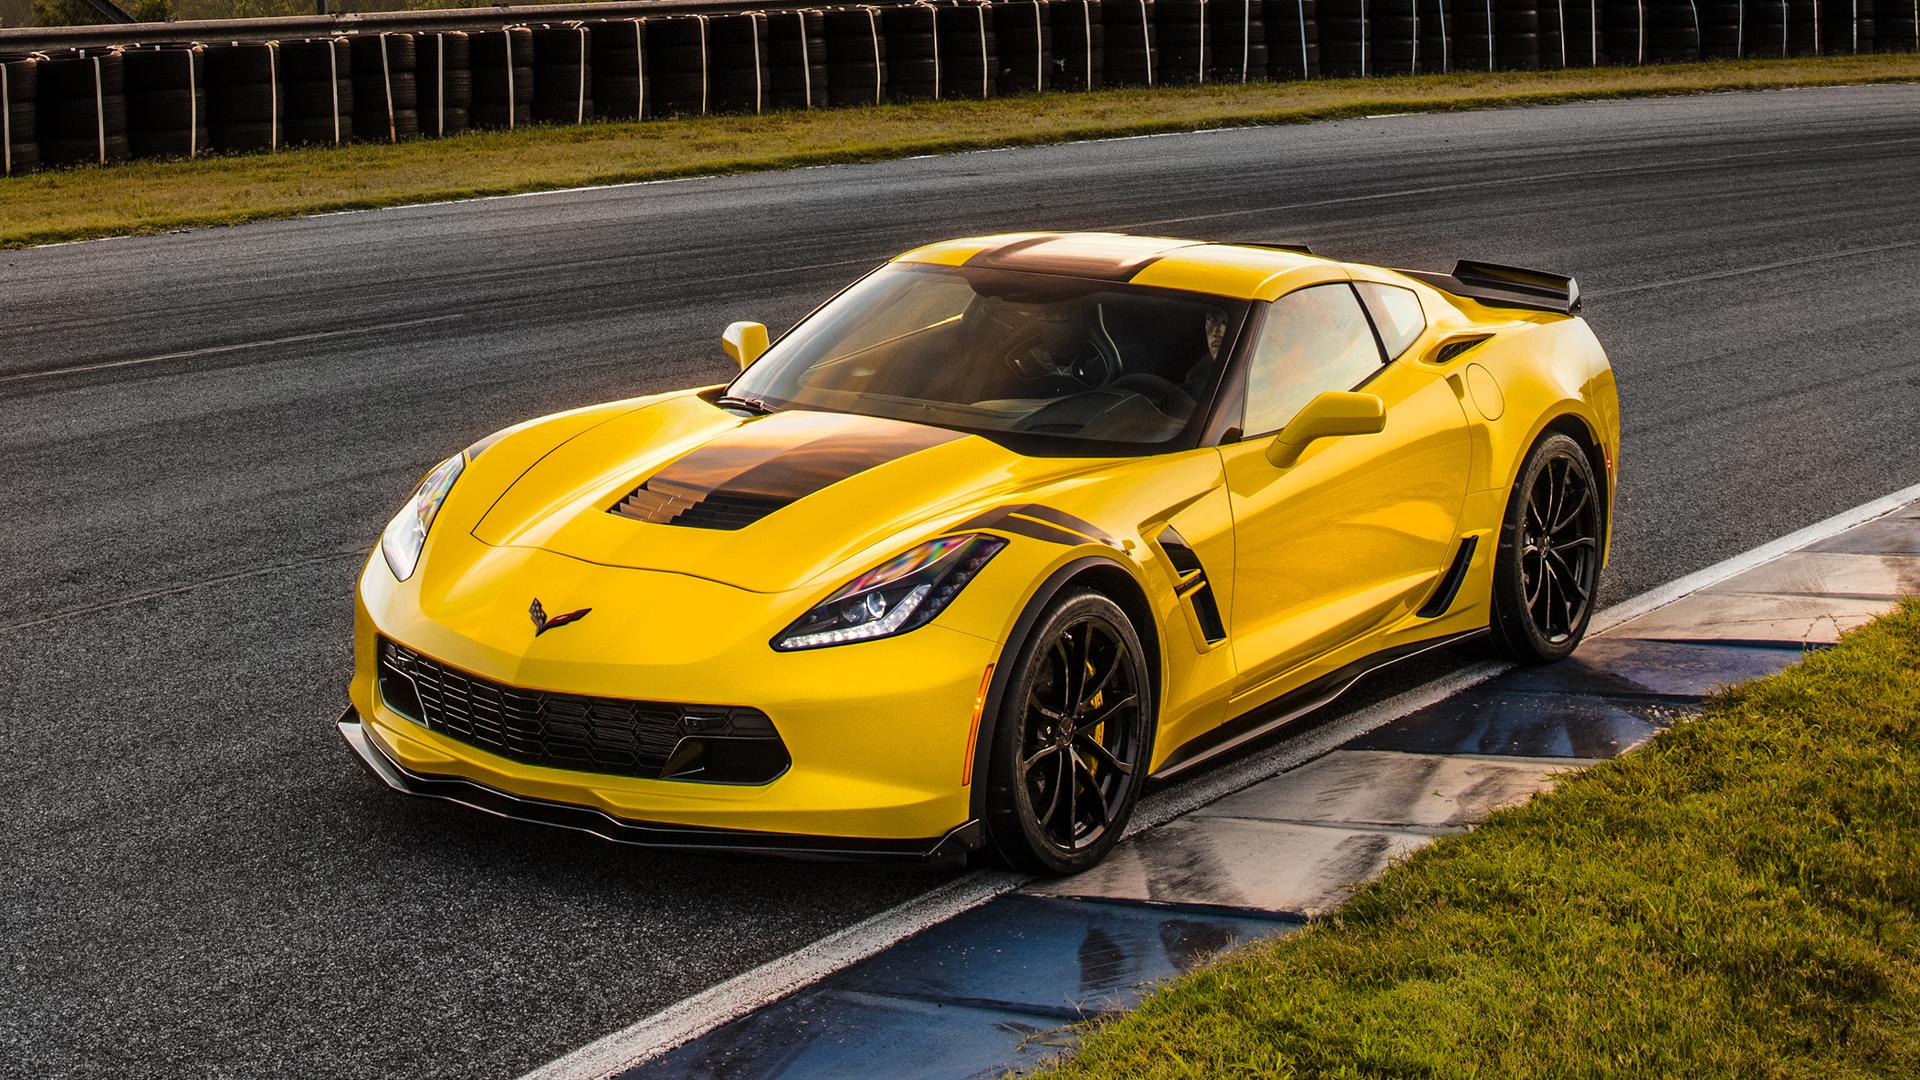 Corvette Grand Sport Iphone Wallpaper: Yellow Chevrolet Corvette Grand Sport 2017 Wallpapers And